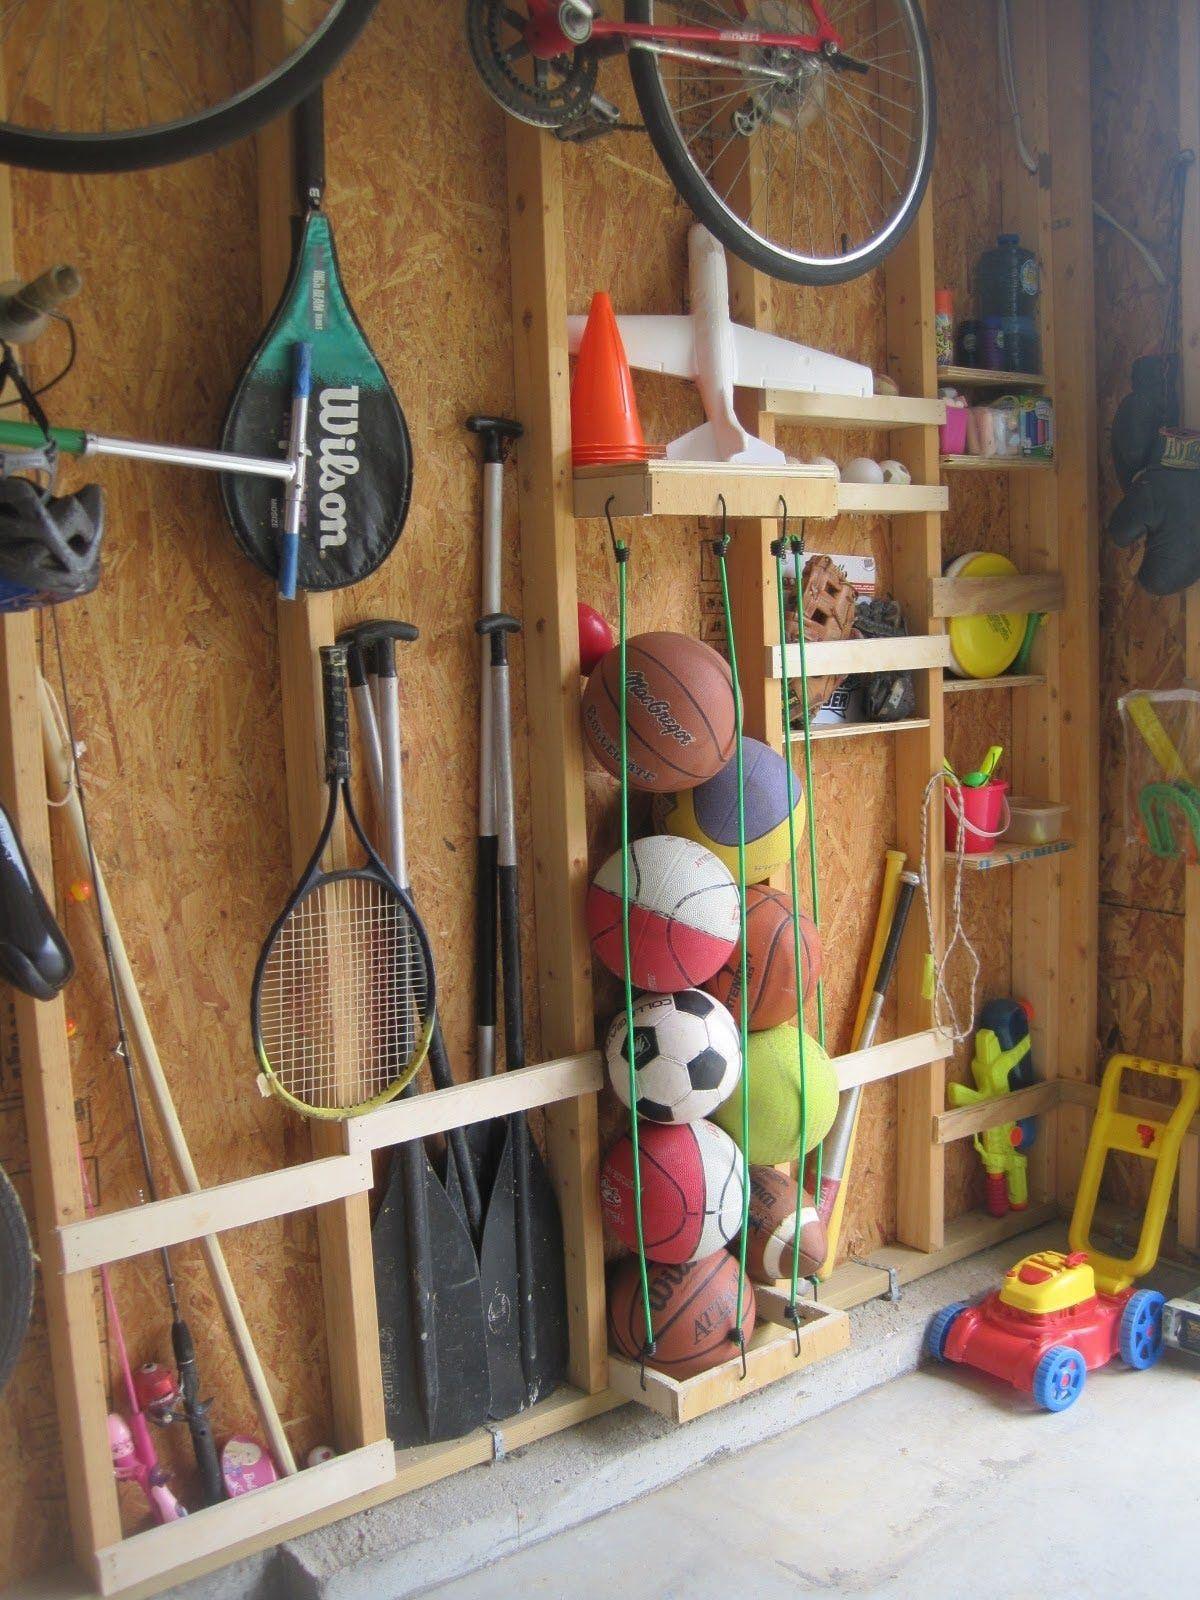 20 clever ideas for a super organized garage diy garage on clever garage organization ideas id=17258